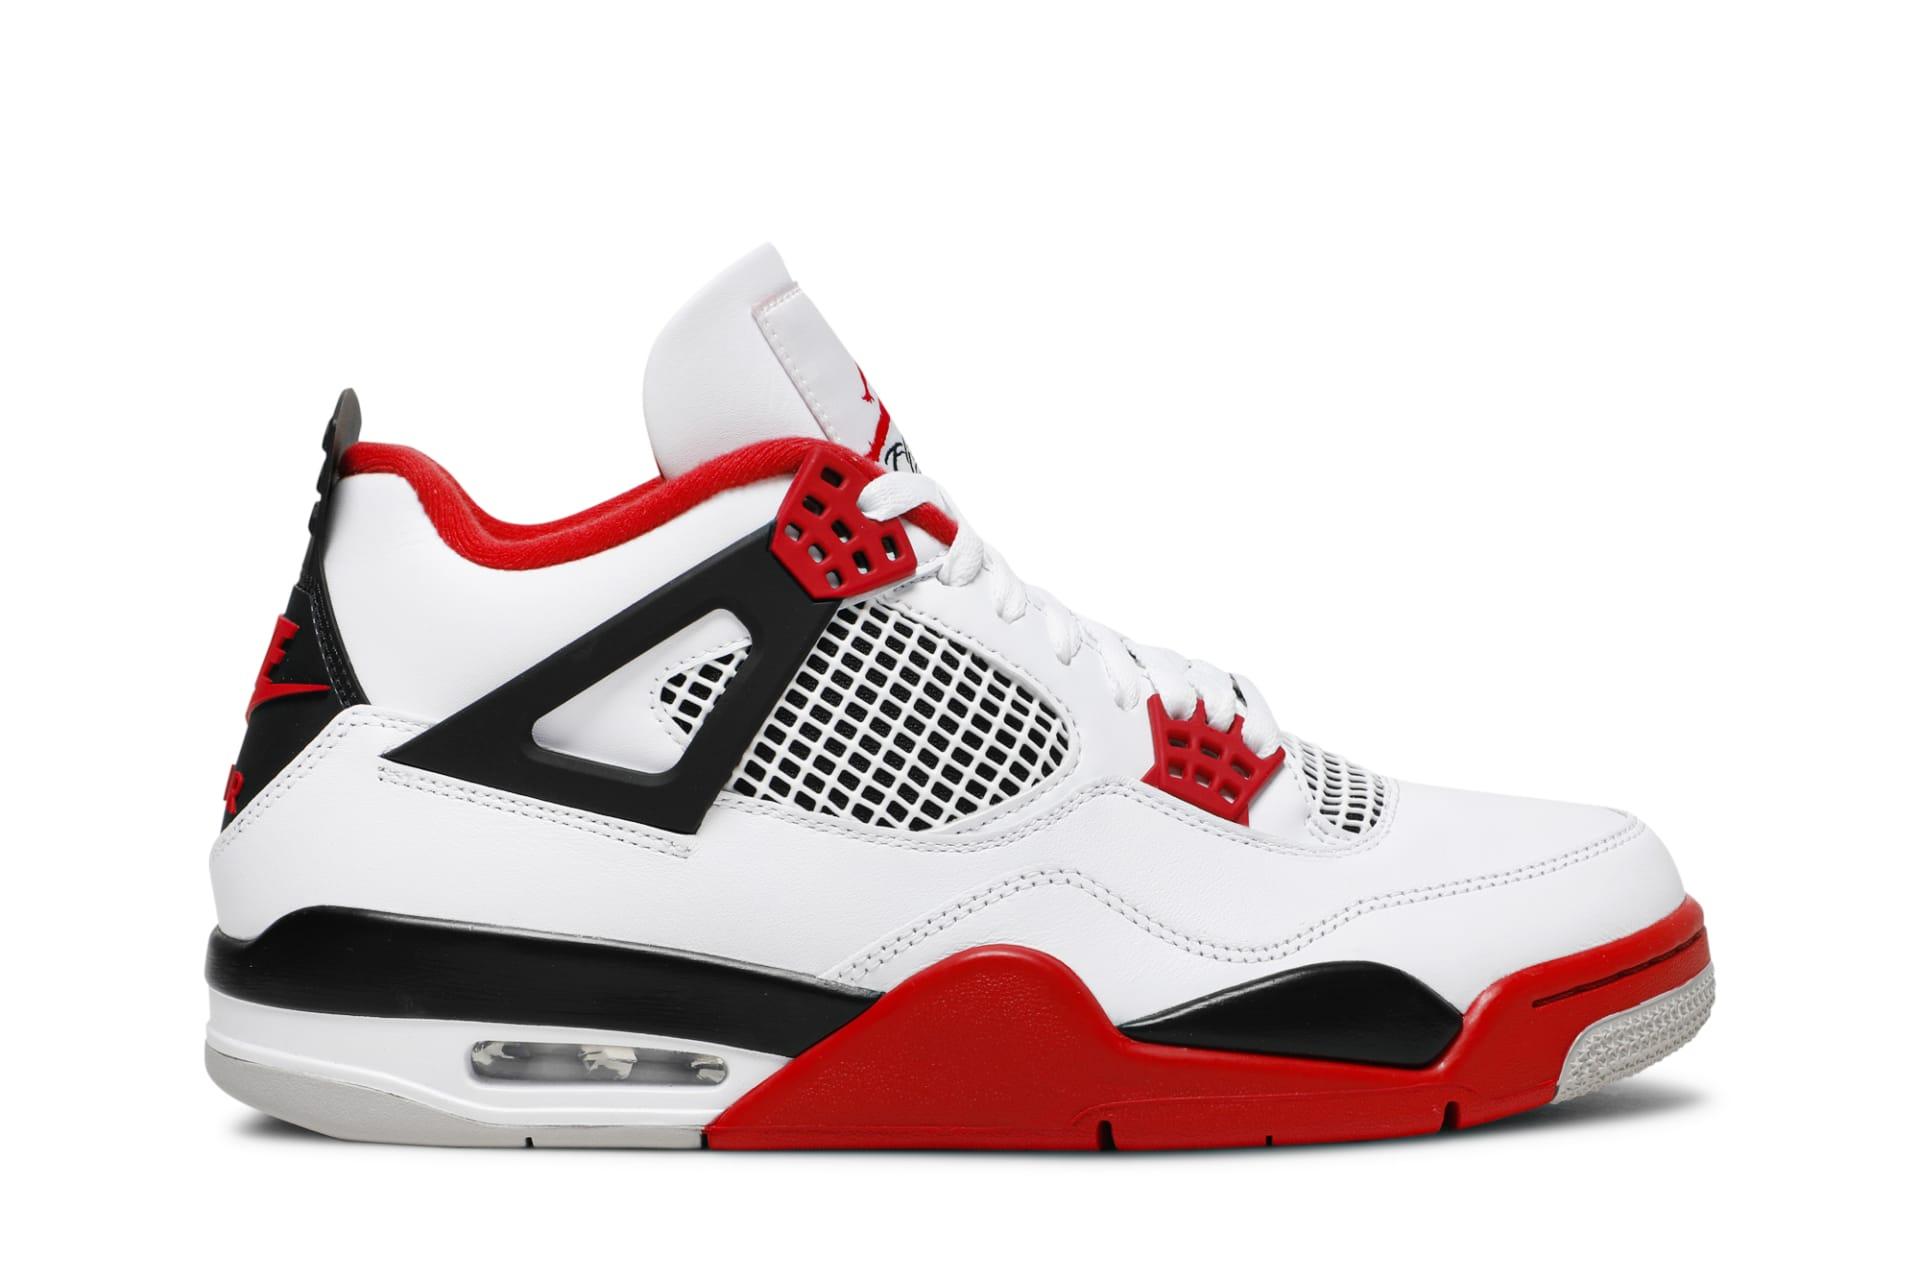 Air Jordan Fire Red